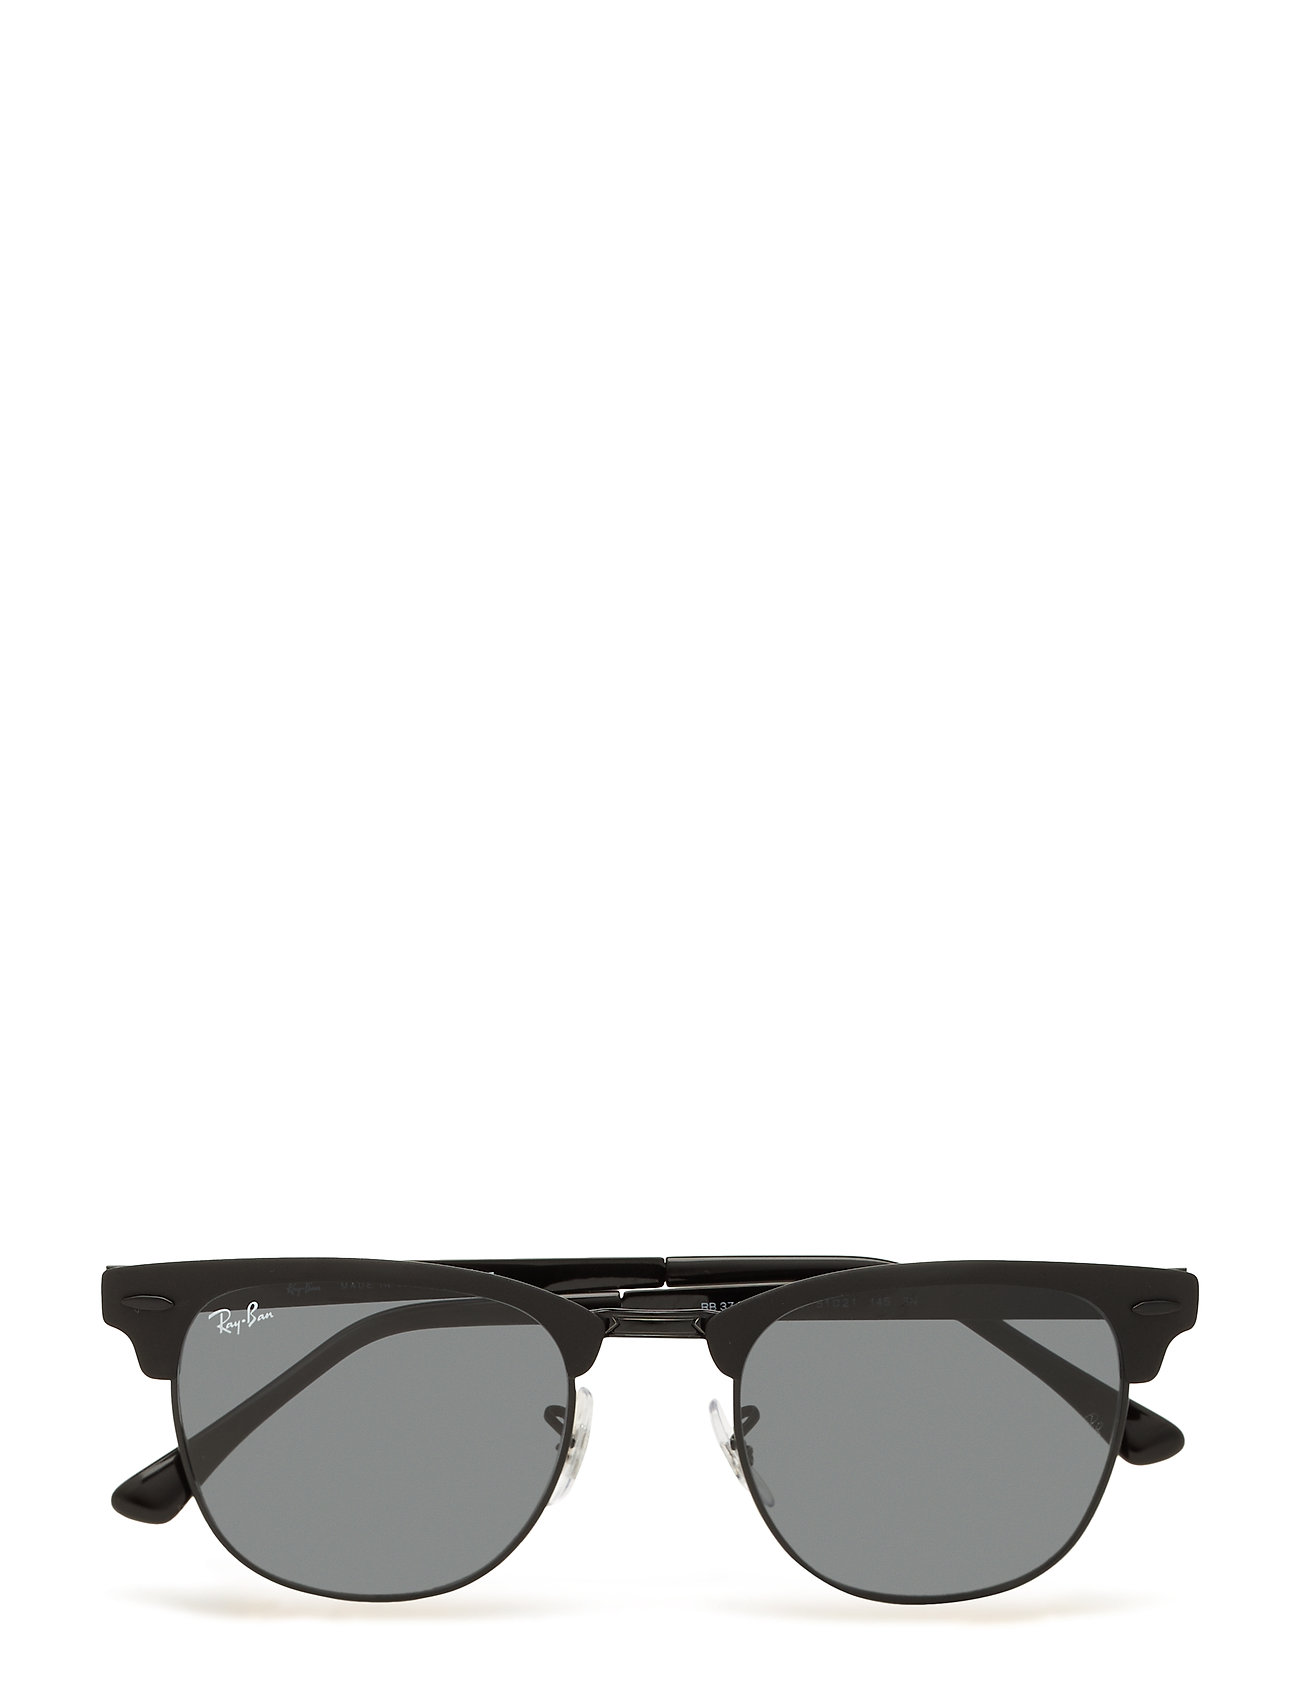 Image of Ray-Ban Sunglasses Solbriller Sort Ray-Ban (3293916255)